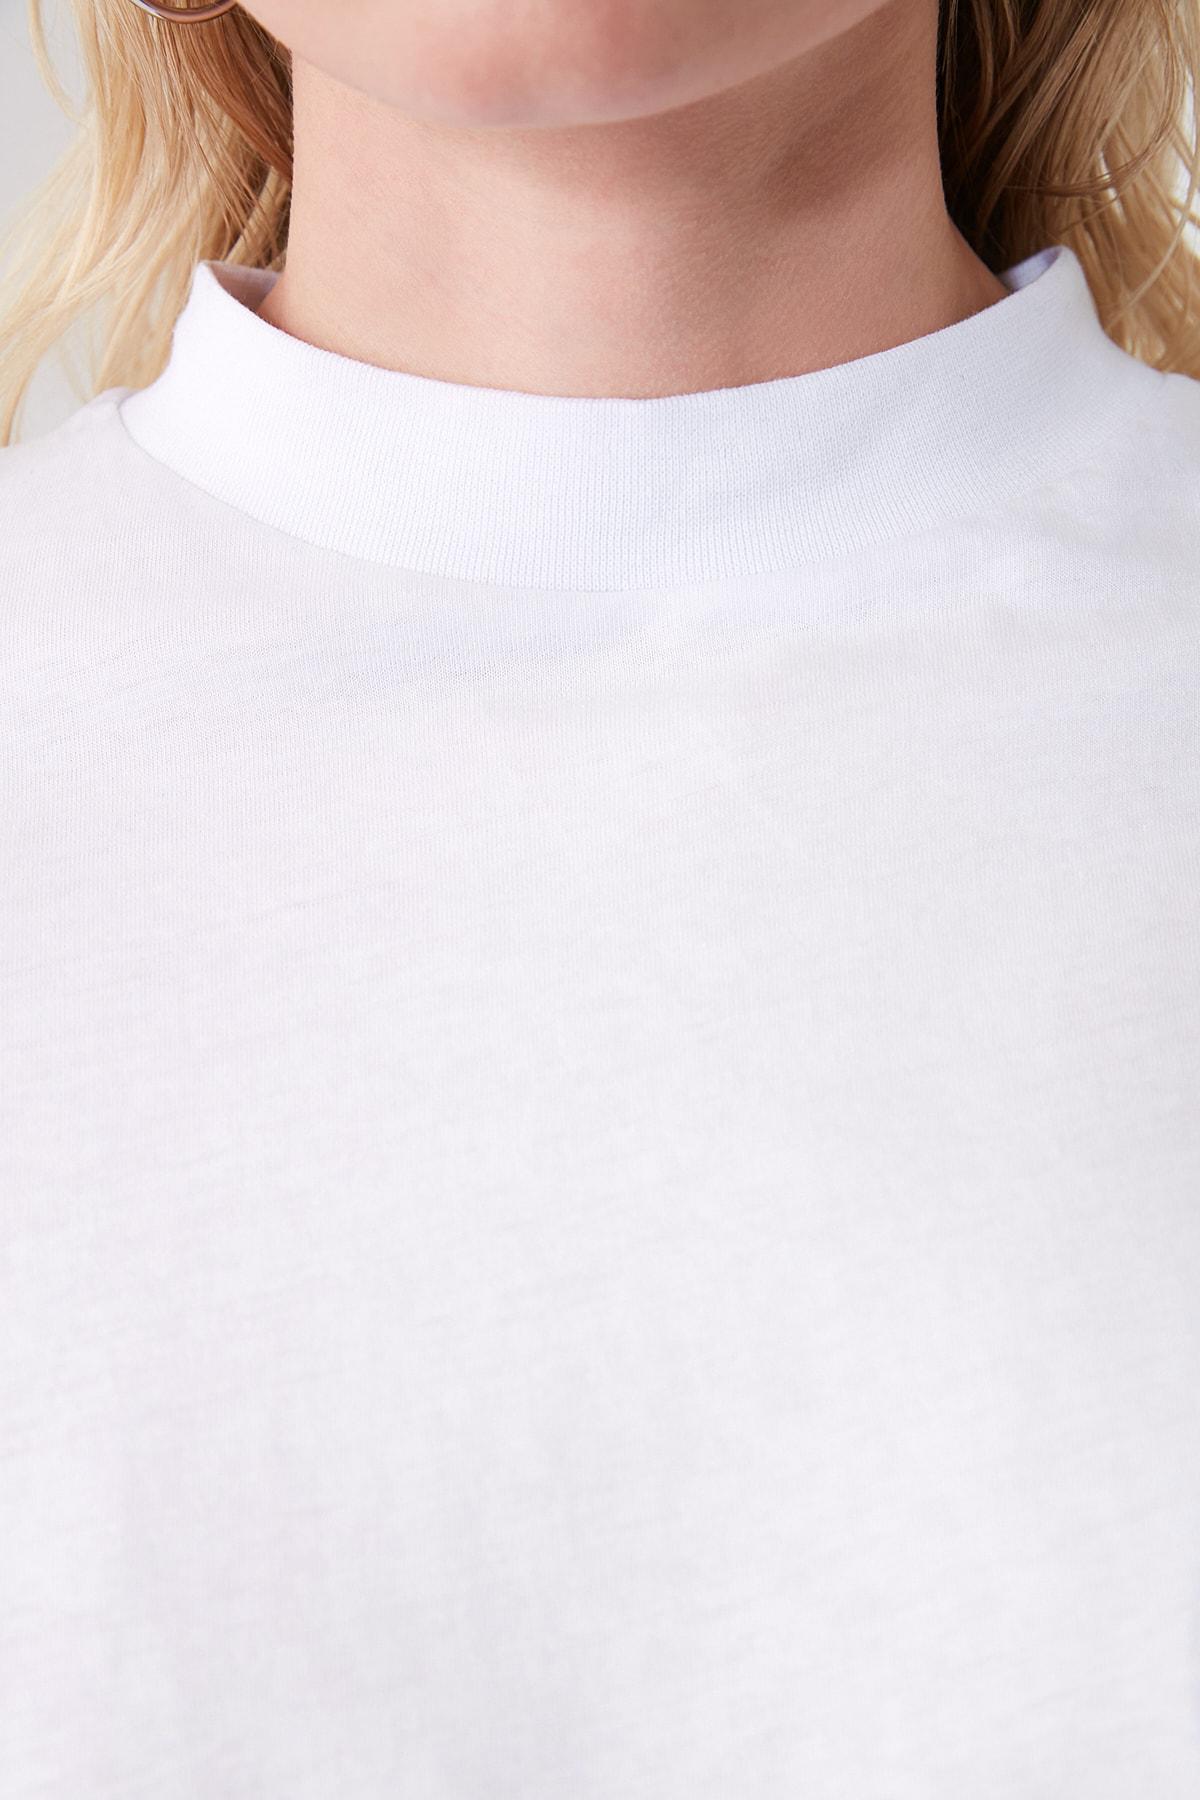 TRENDYOLMİLLA Beyaz Dik Yaka Basic Örme T-shirt TWOAW20TS0096 2